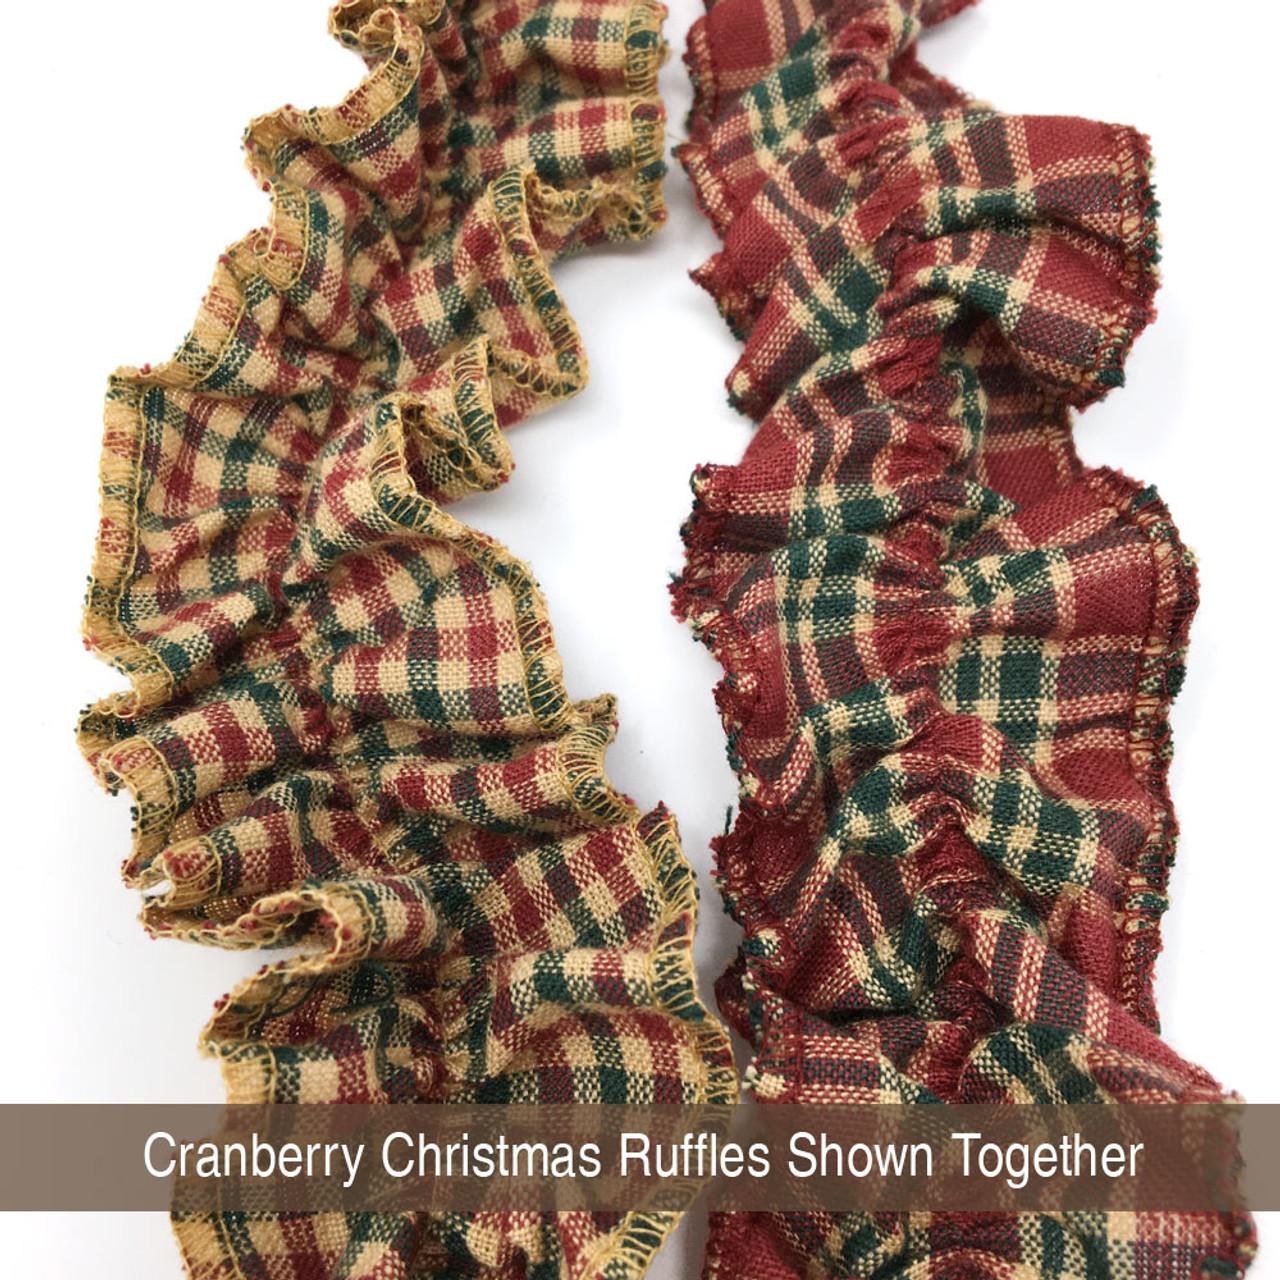 Cranberry Christmas 4 Ruffled Trim/Garland  - 1 roll - 144 inches (12 feet)